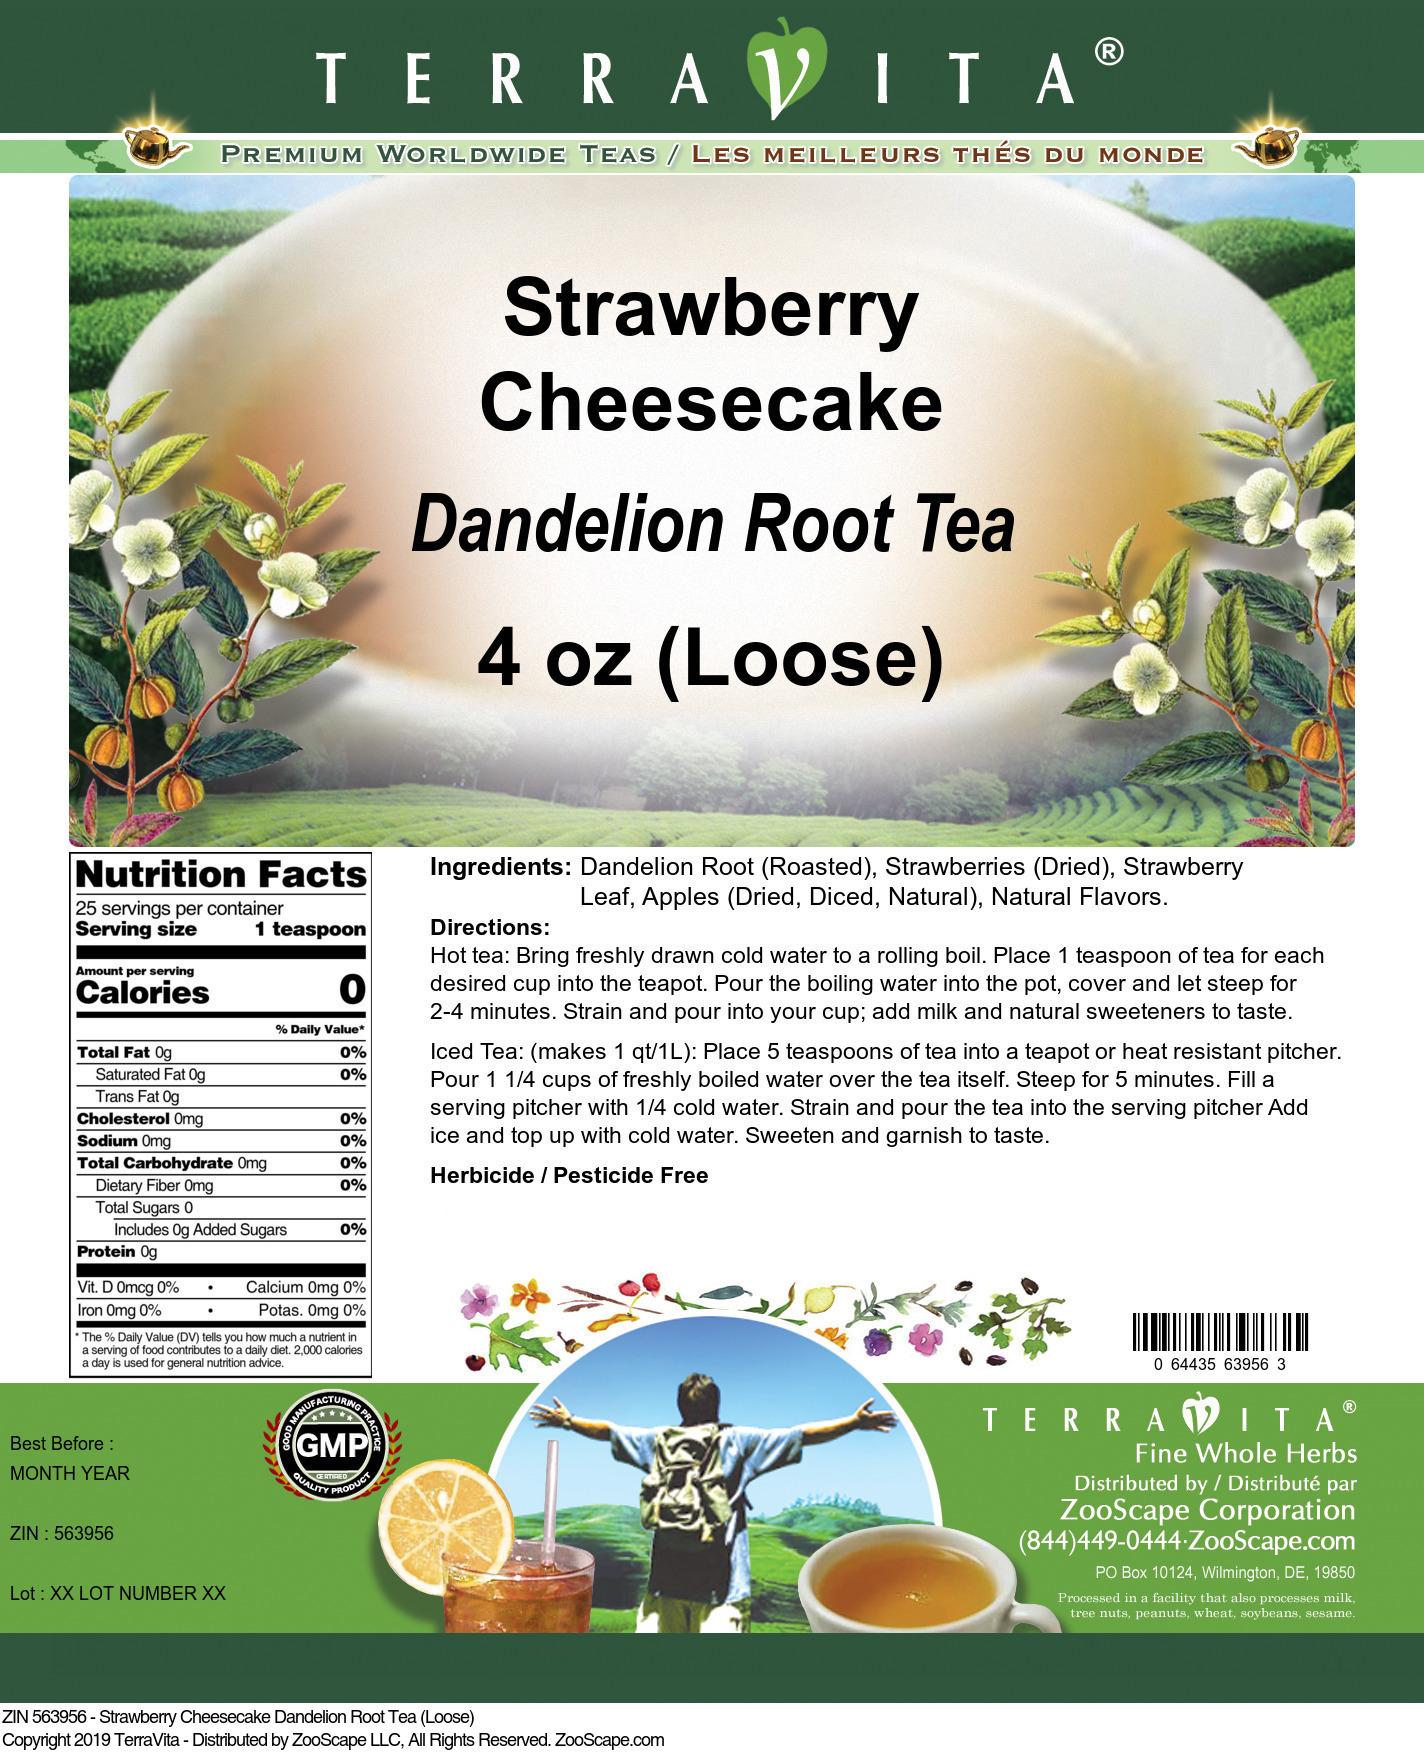 Strawberry Cheesecake Dandelion Root